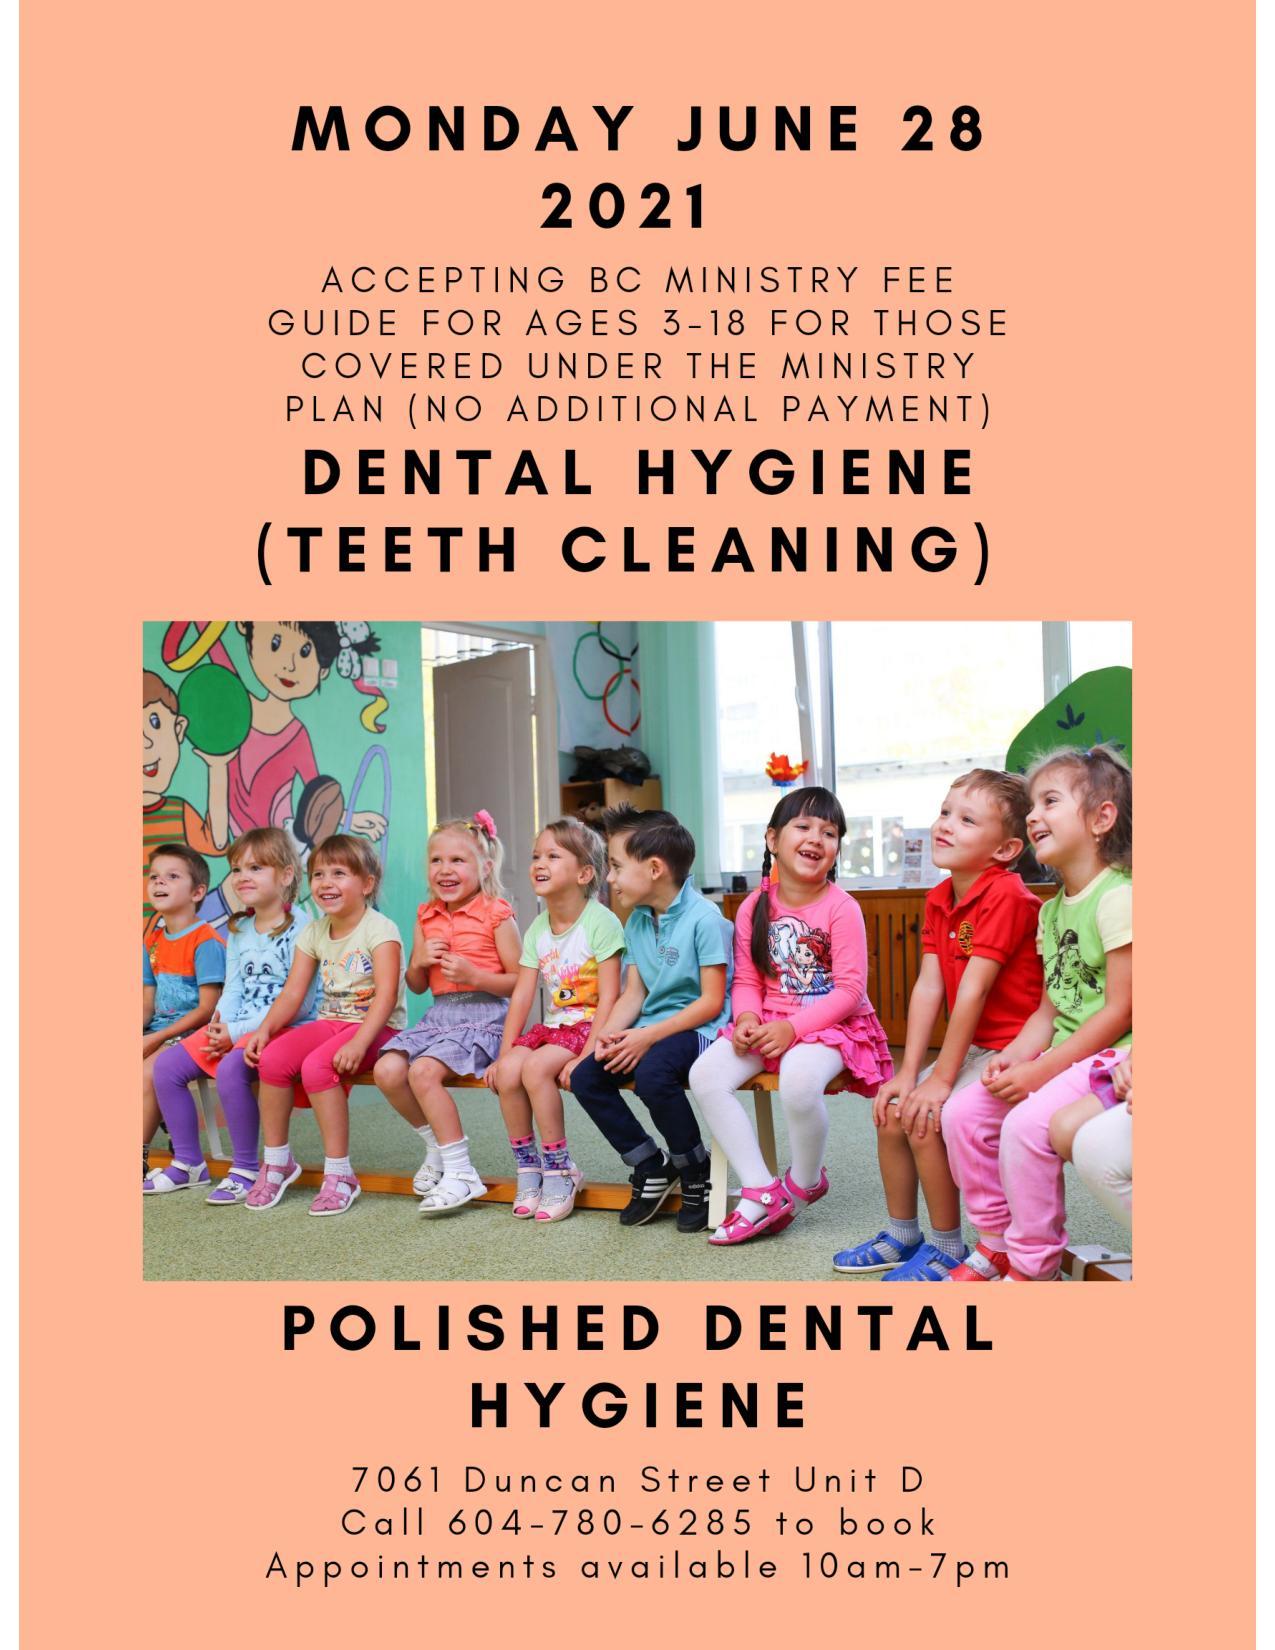 Polished Dental Hygiene